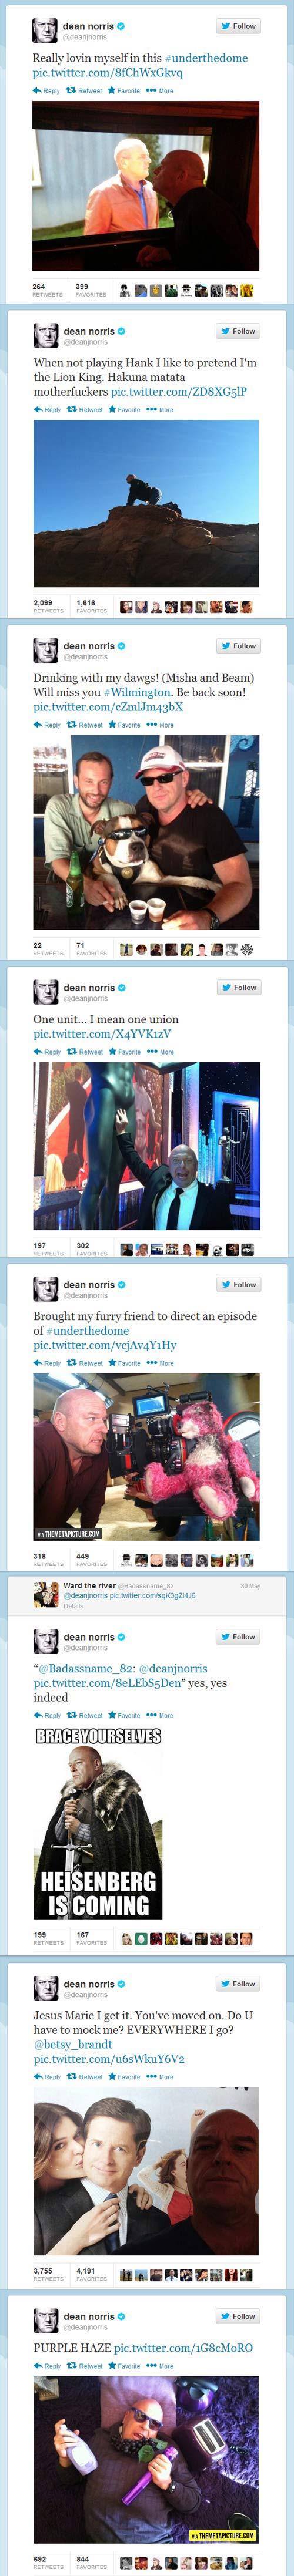 funny-Dean-Norris-Twitter-post